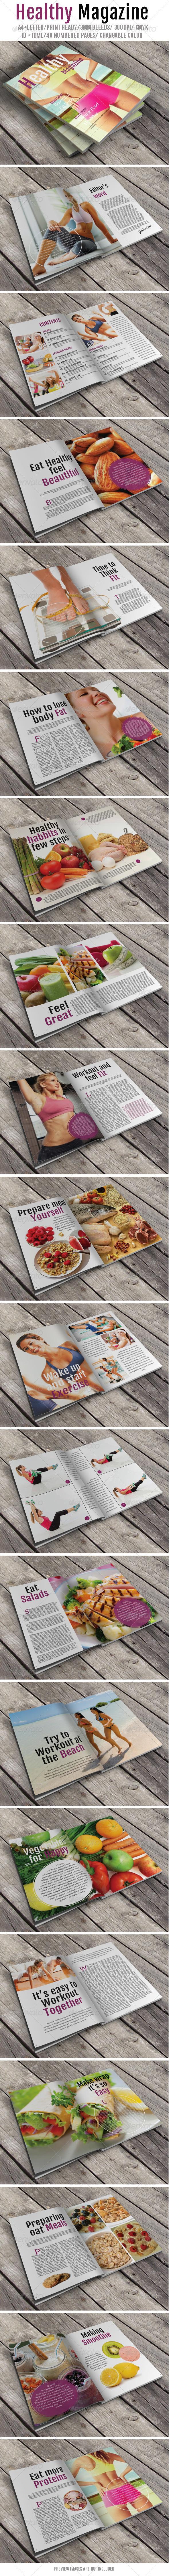 Healthy Magazine - Magazines Print Templates